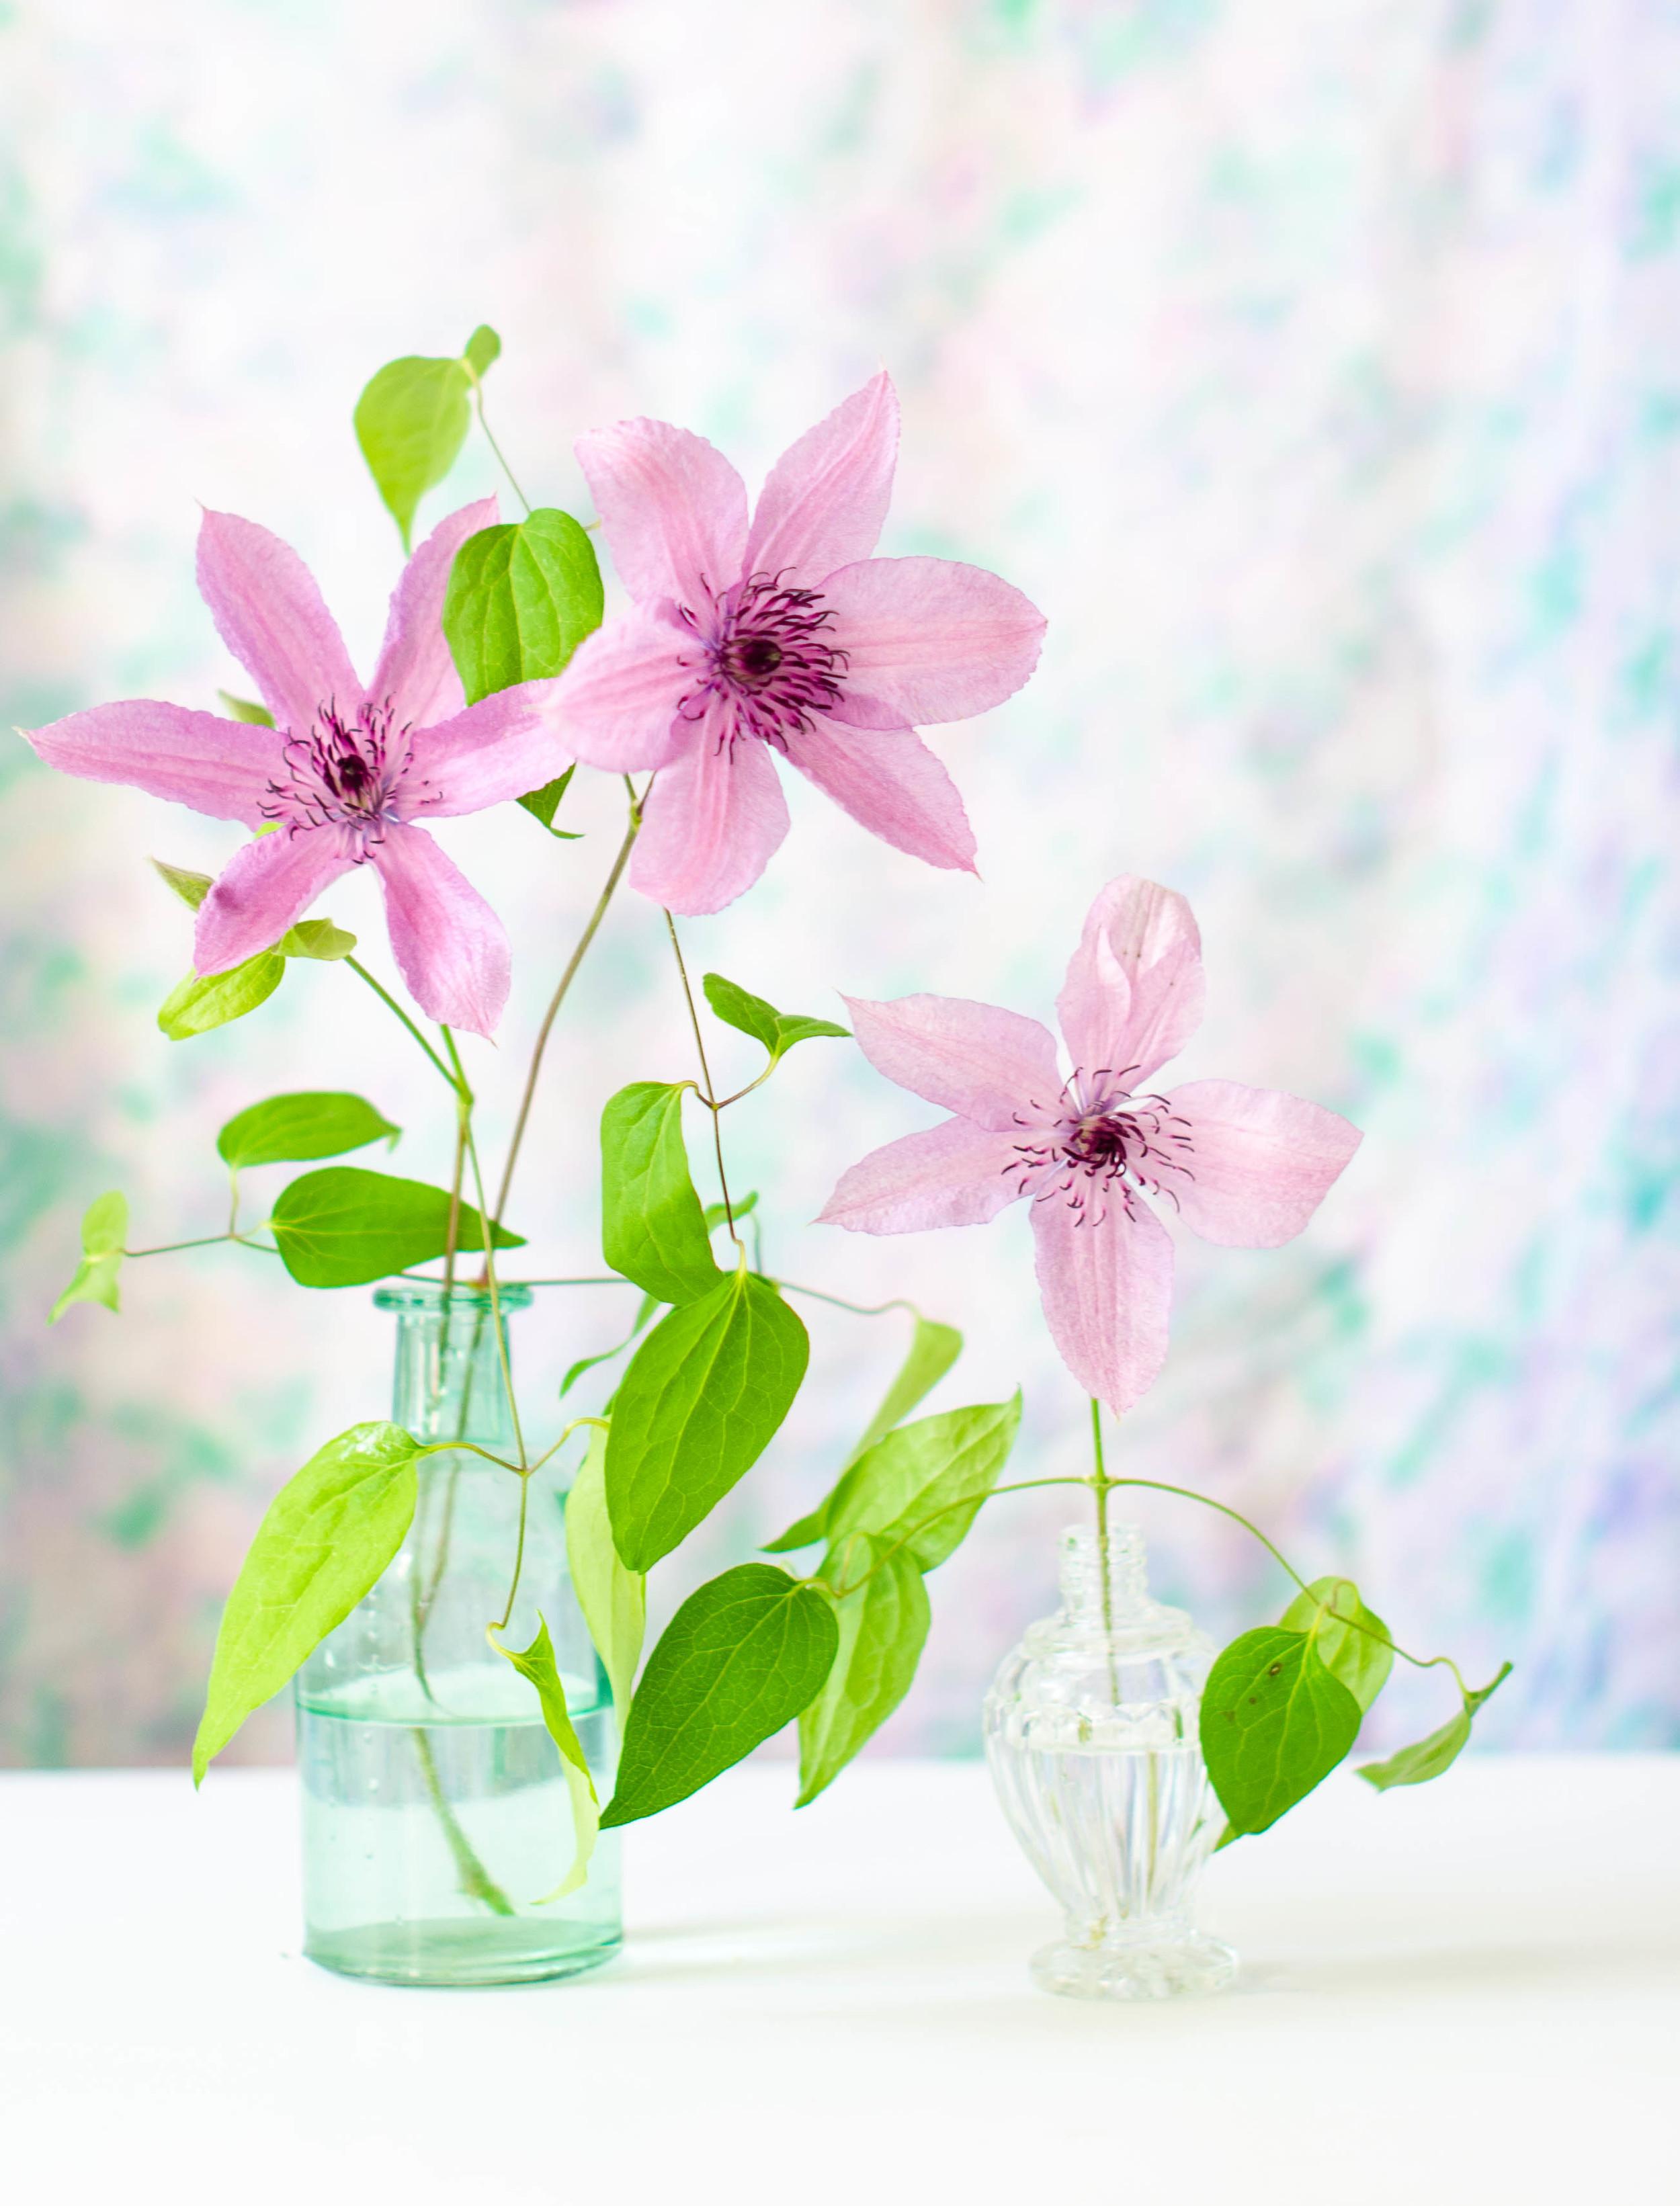 rose & ivy journal petal by petal pink chiffon clematis